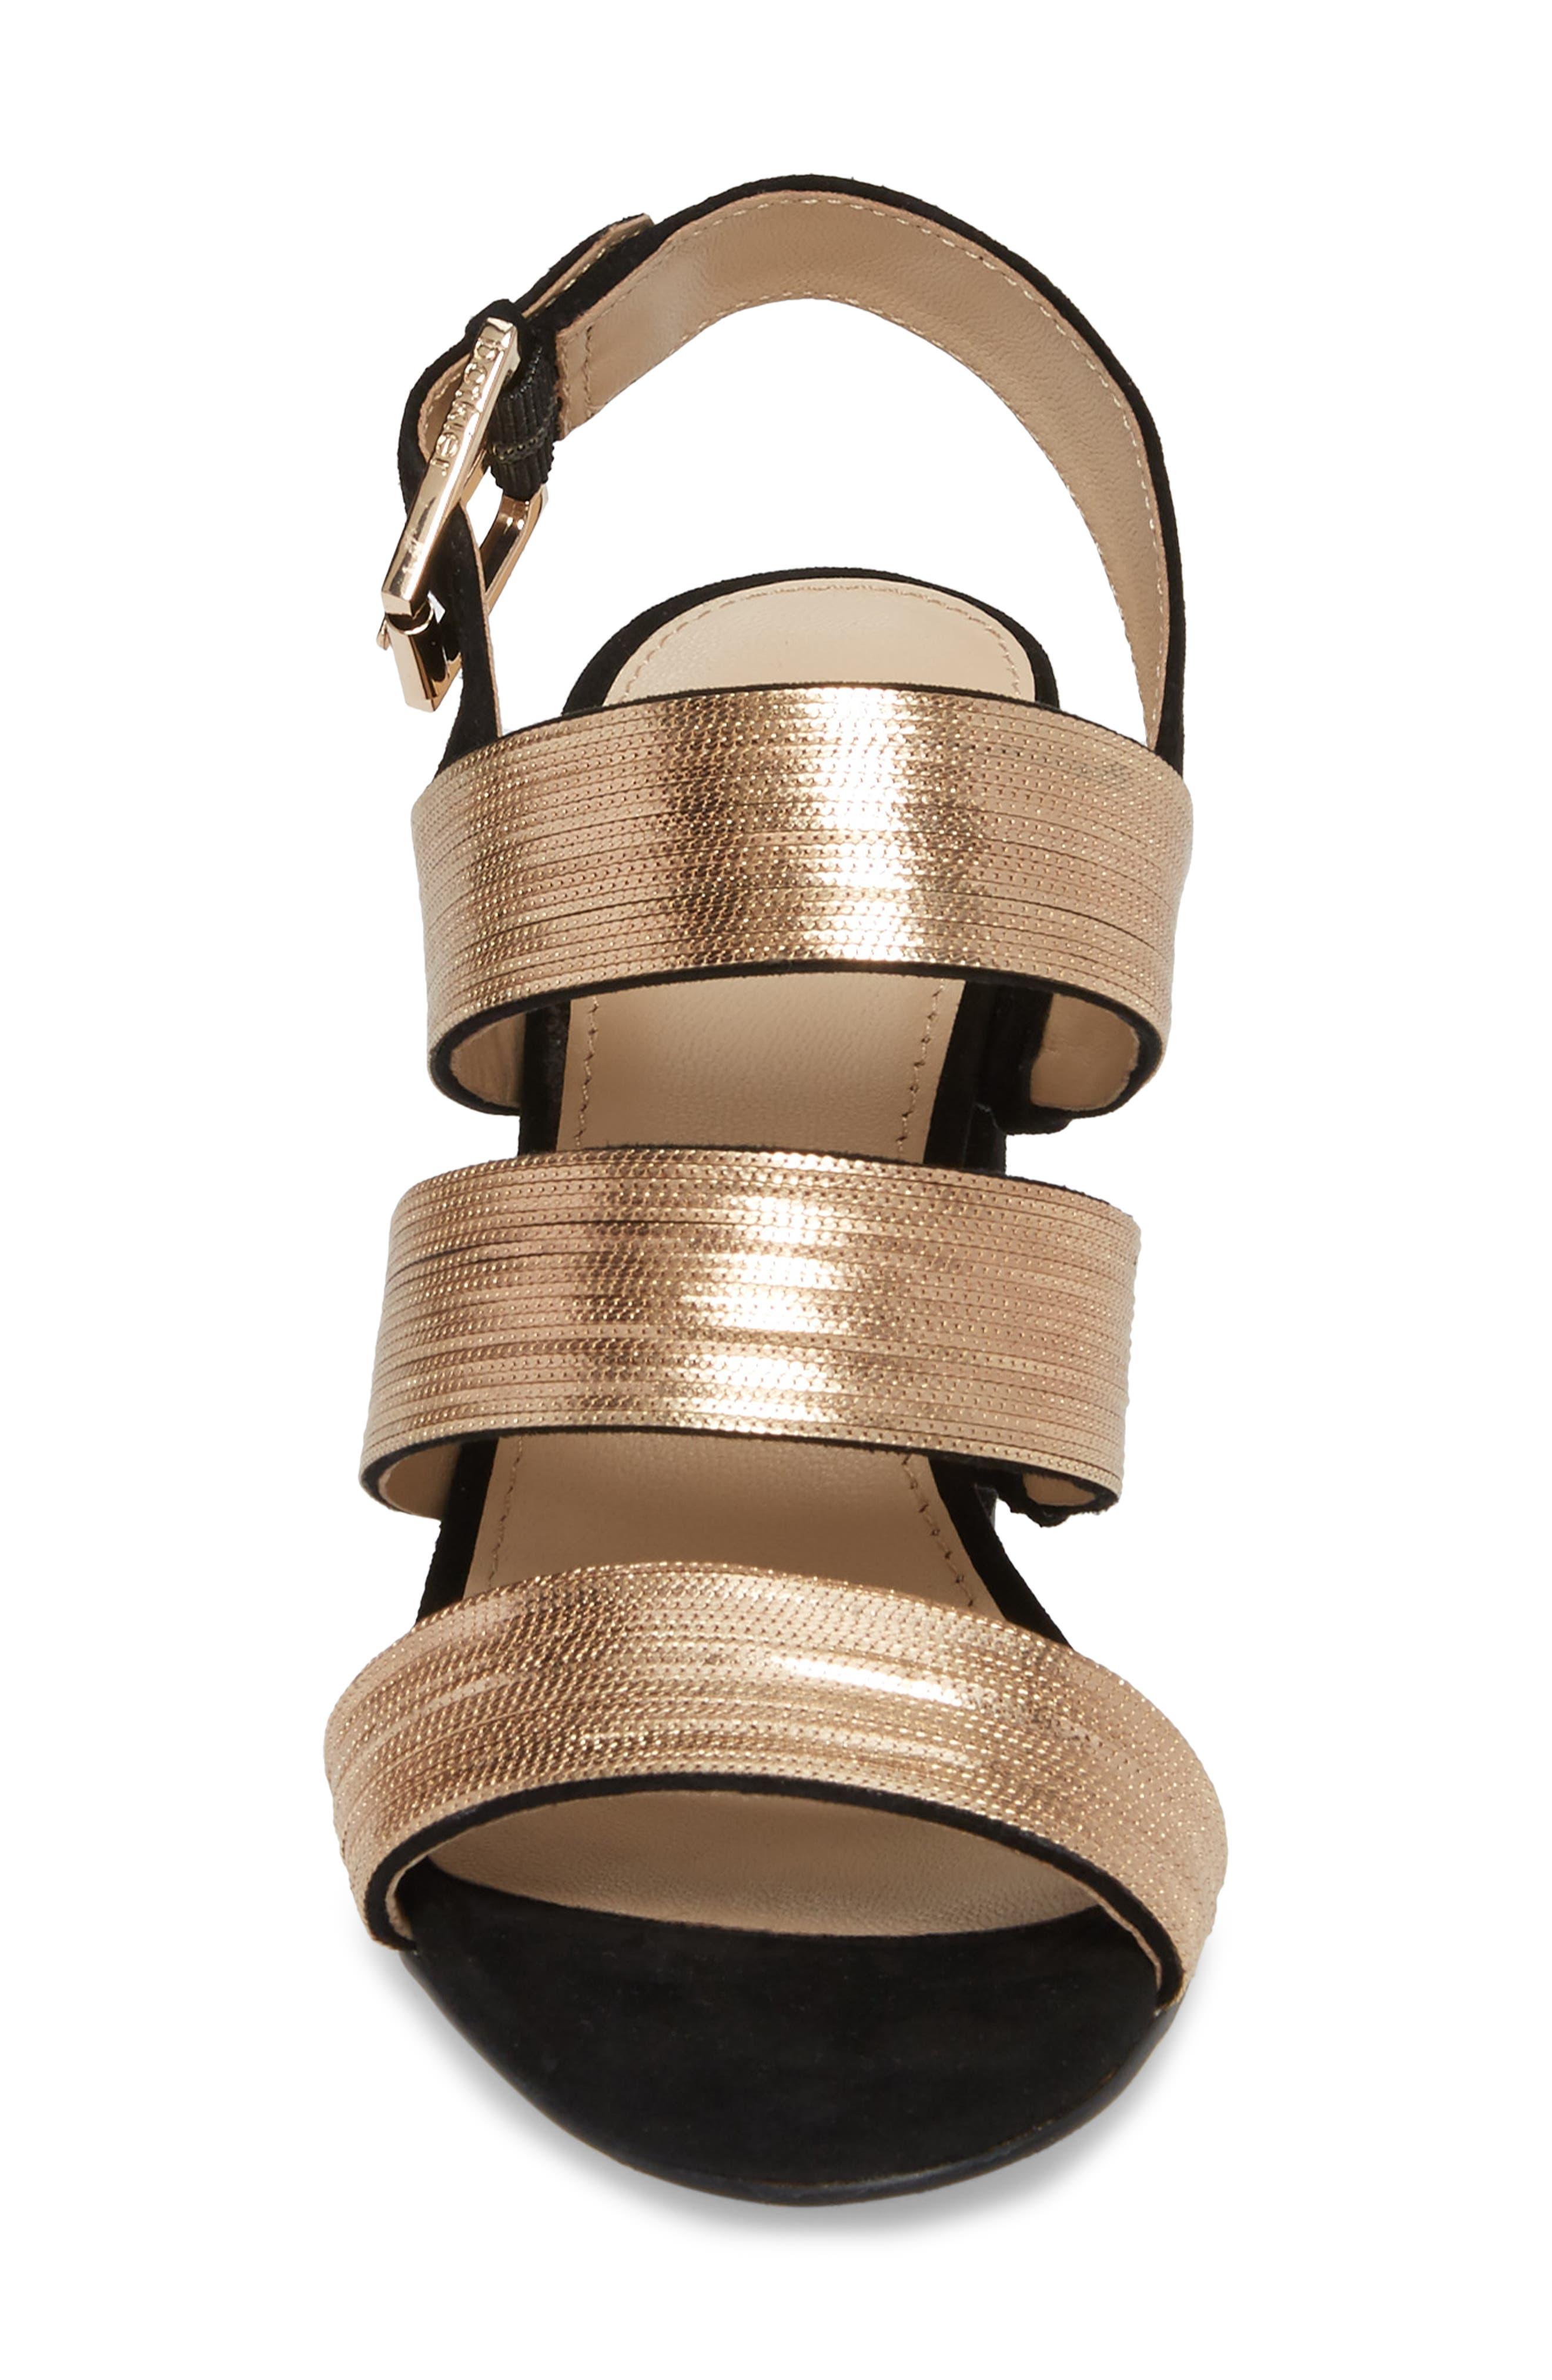 Genesa Chain Slingback Sandal,                             Alternate thumbnail 4, color,                             Black/ Gold Suede